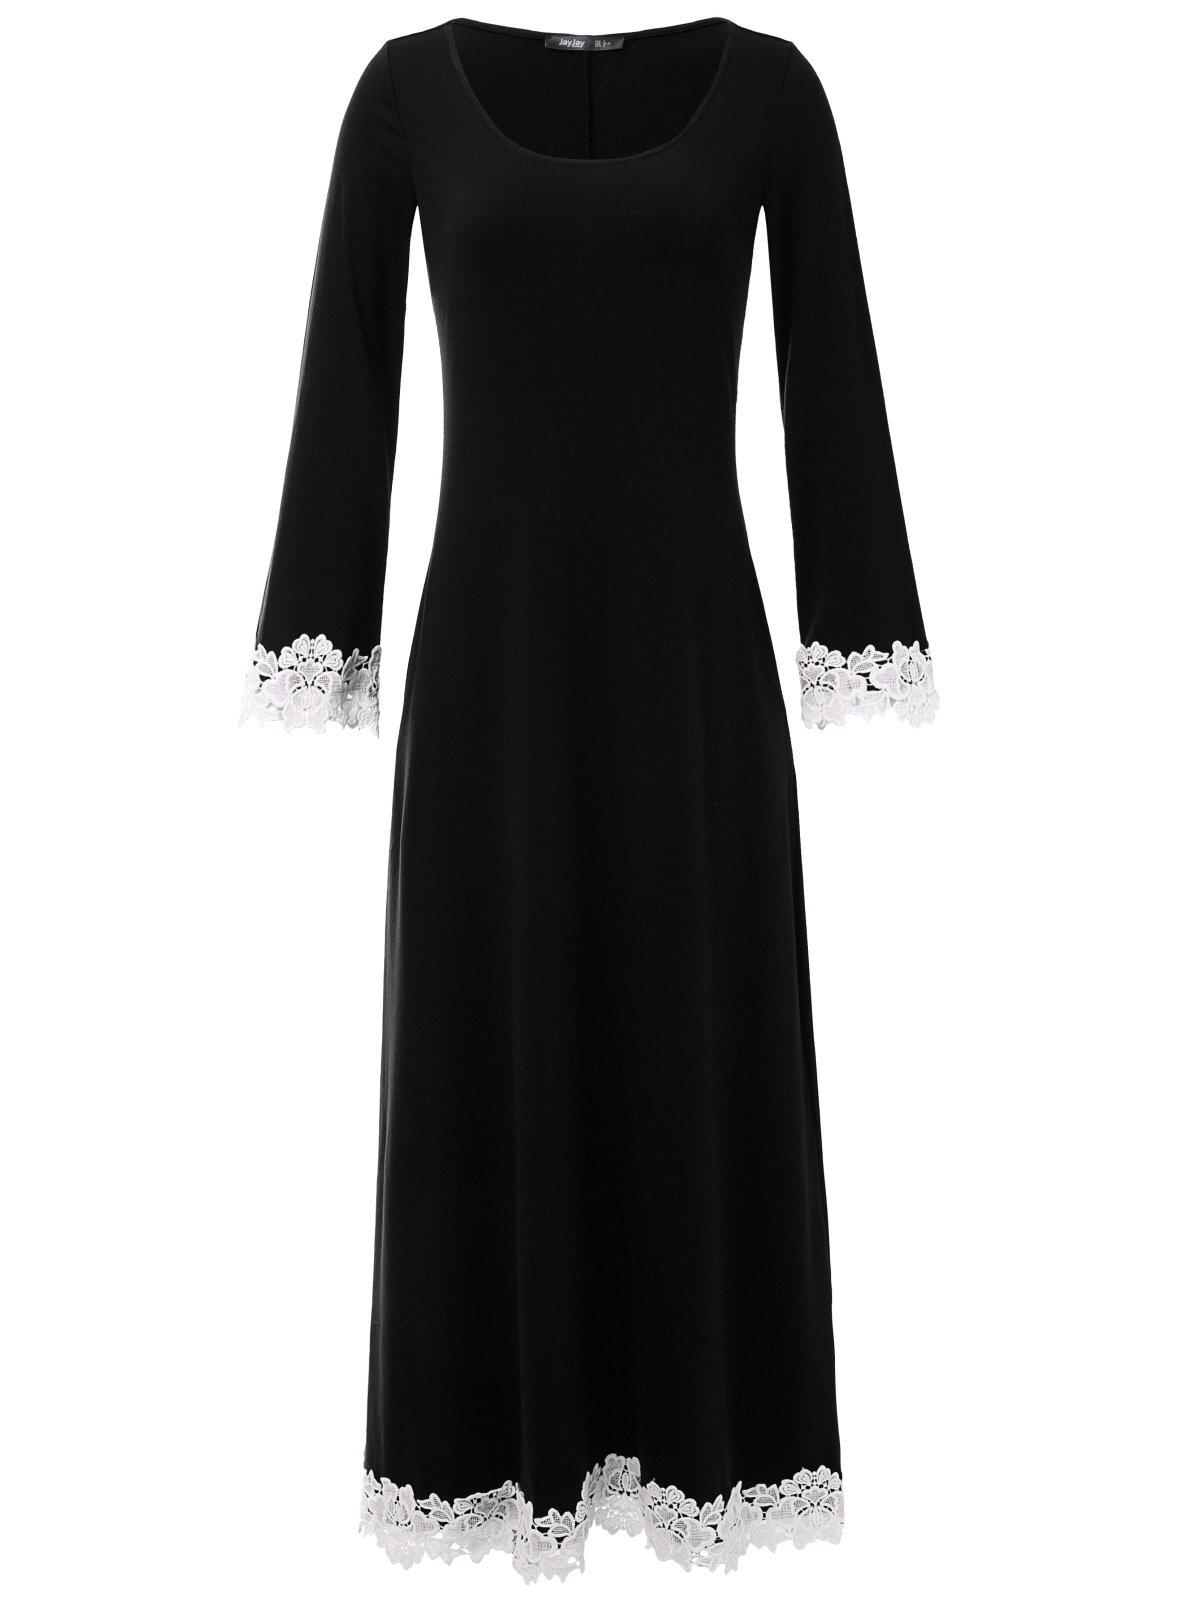 JayJay Women Gorgeous Long Trumpet Sleeve Lacy Maxi Dress with Pocket,Black,M by JayJay Company